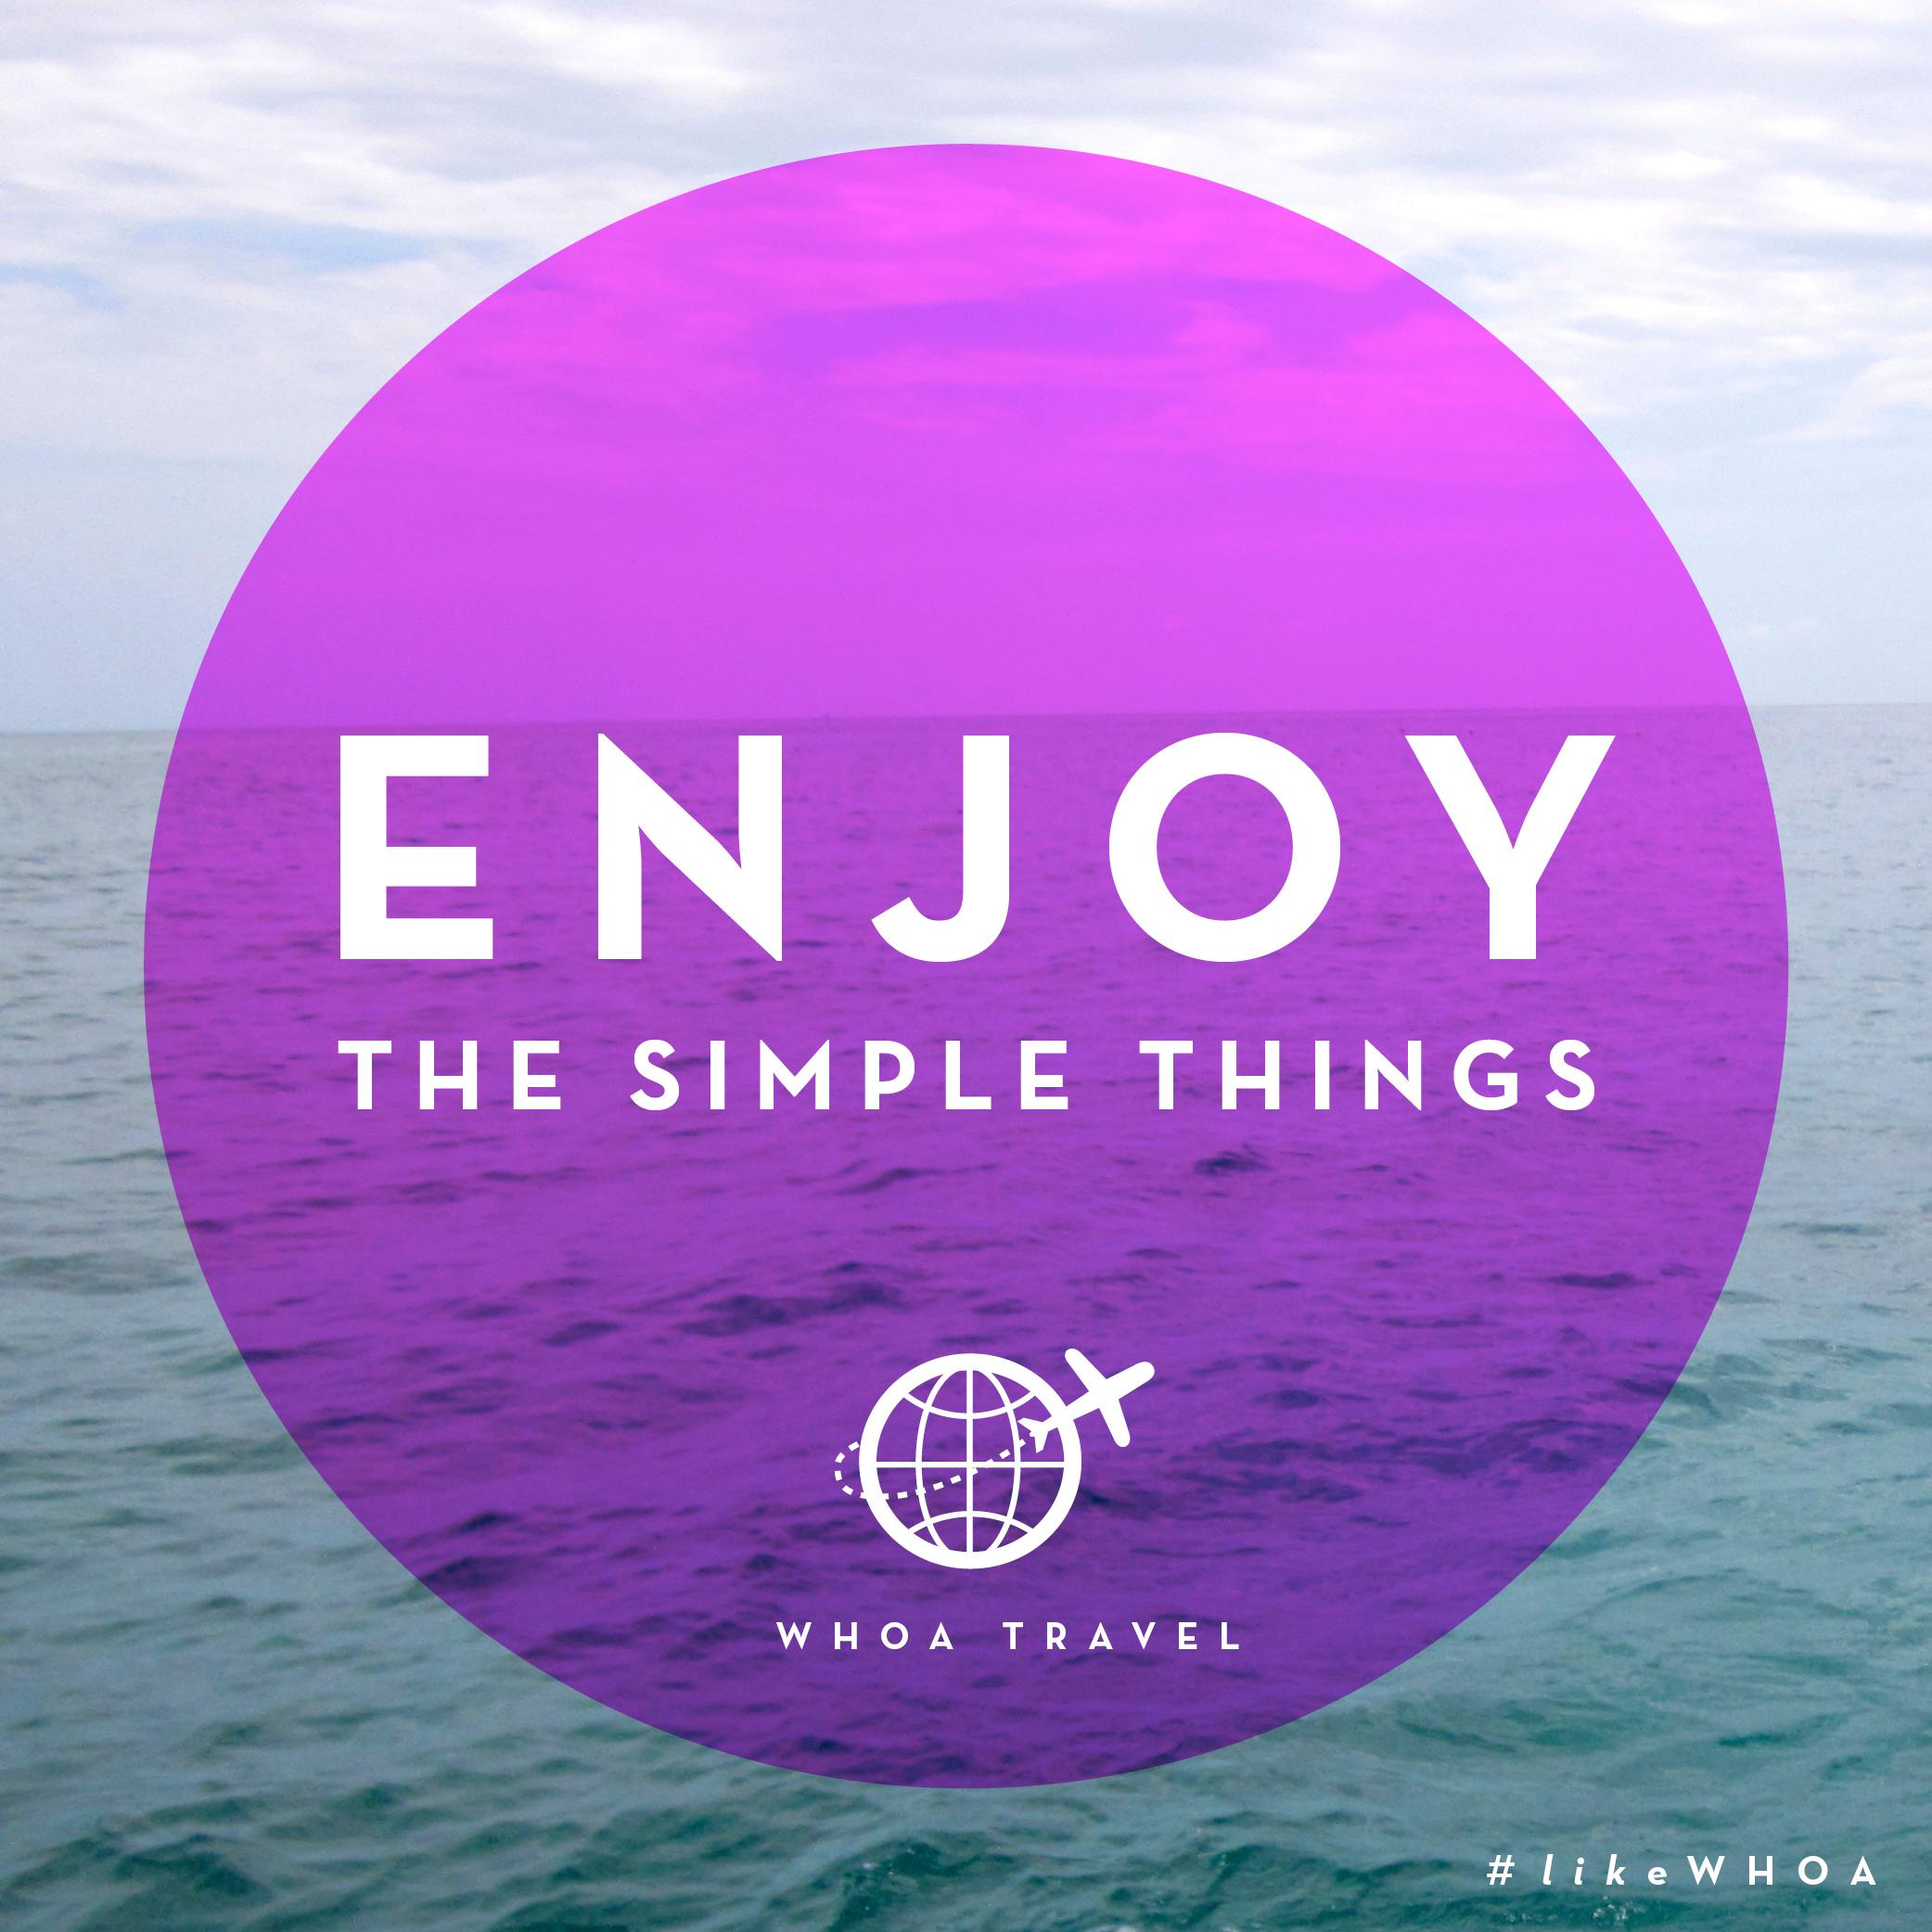 WHOA travel inspiration ADVENSPIRATION enjoy